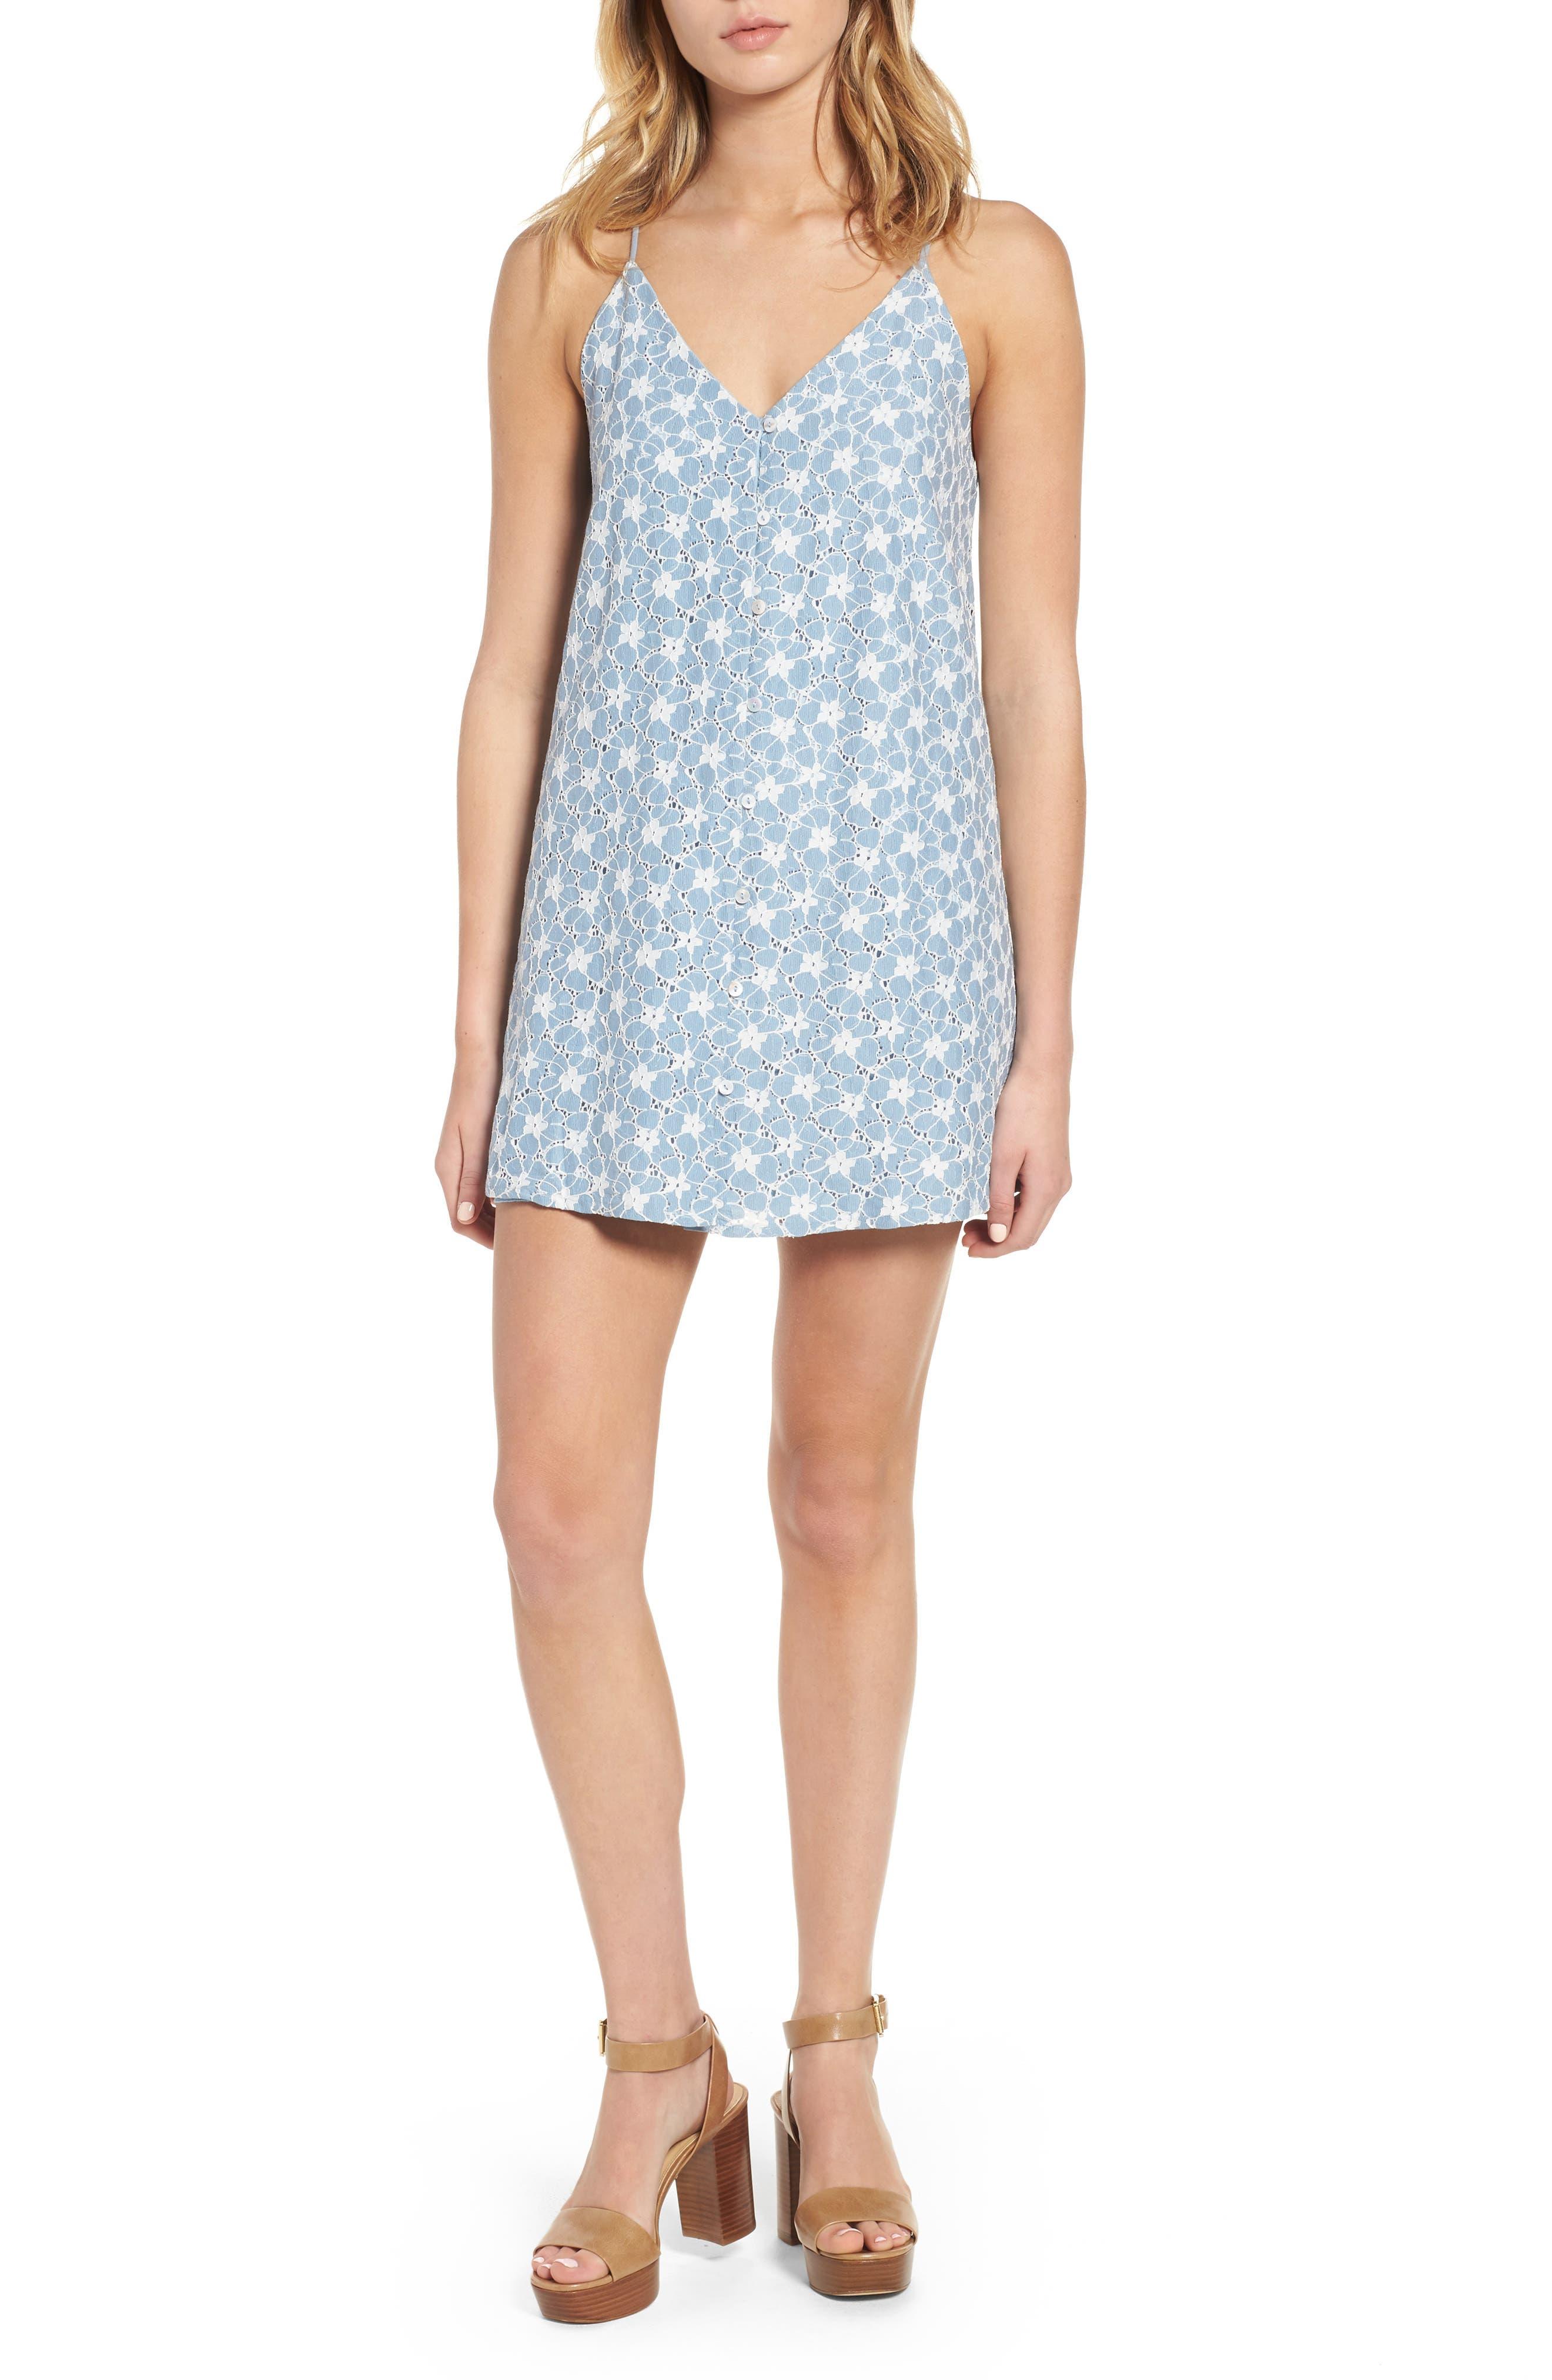 Dee Elly Lace Camisole Dress